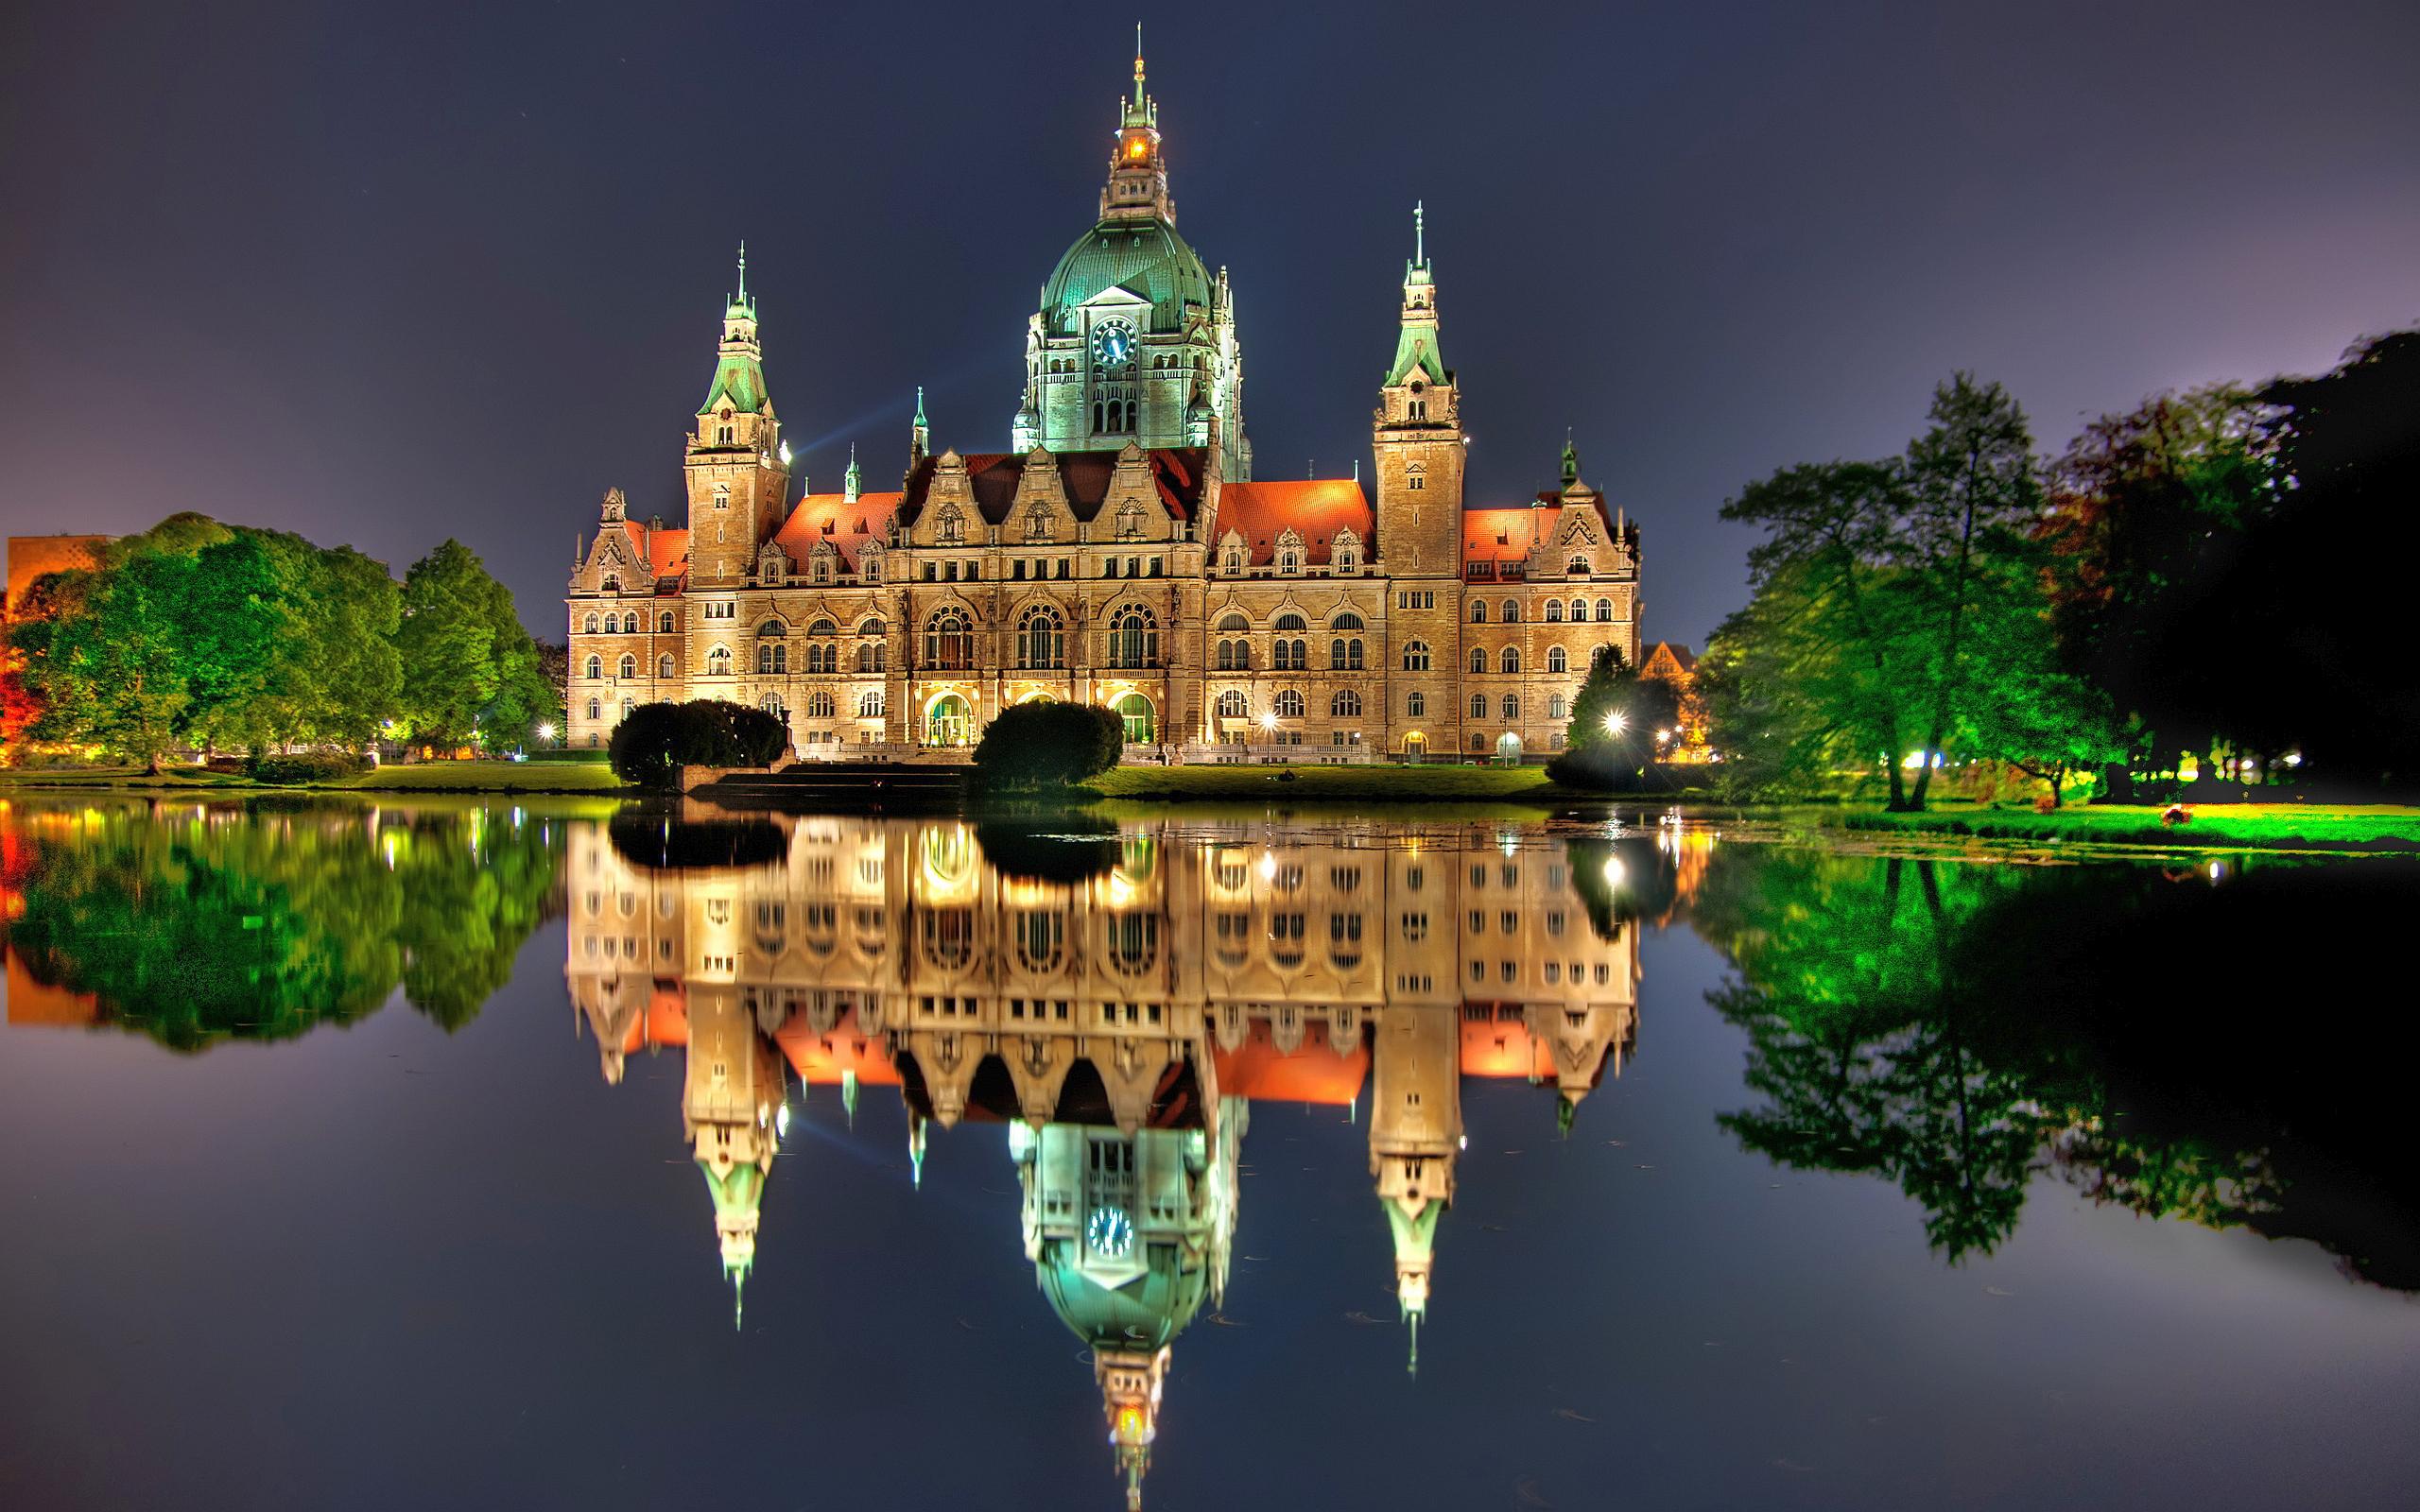 City hall hannover